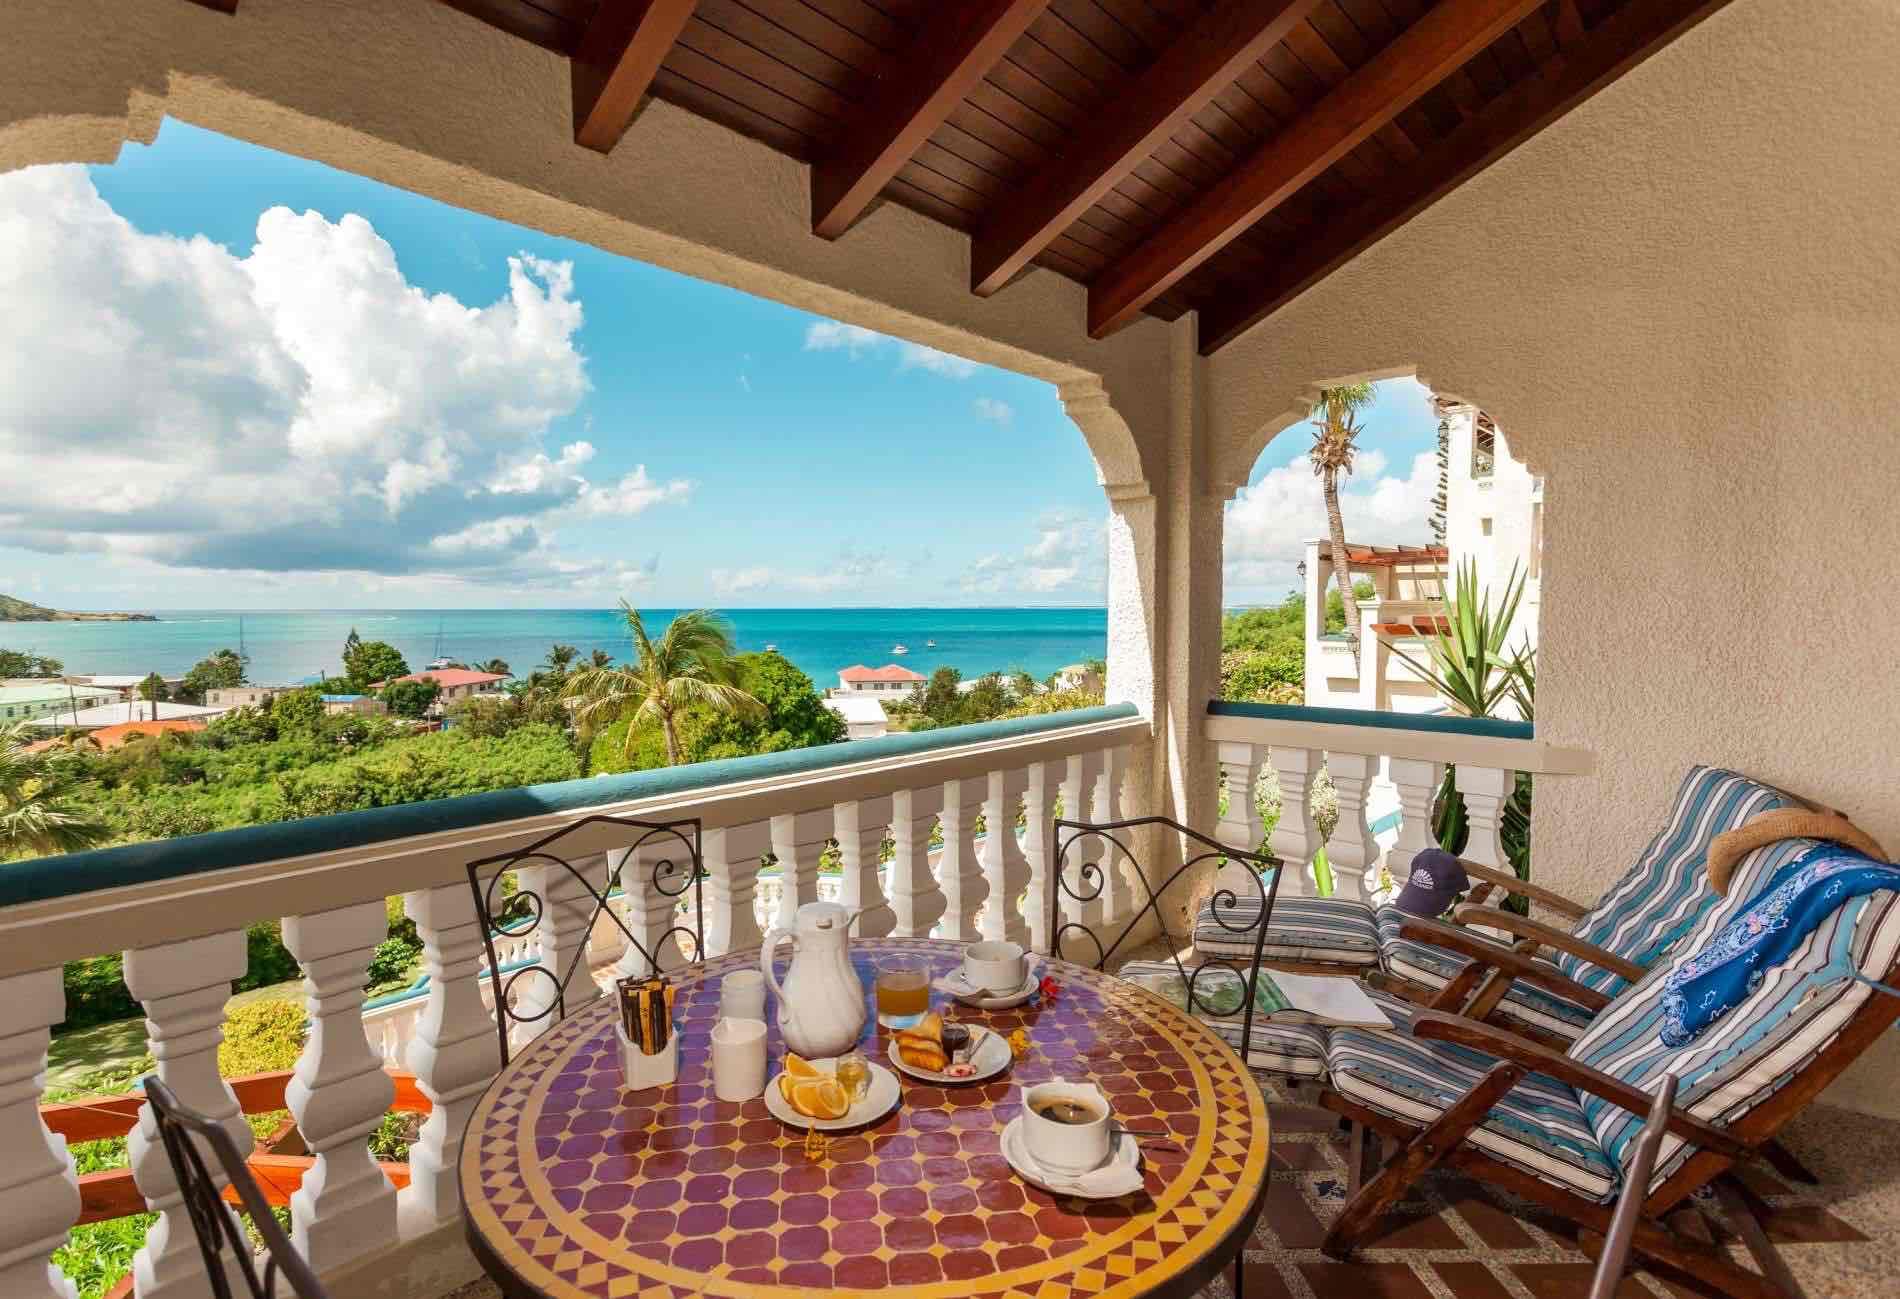 Balcony view from  Hotel L'Esplanade